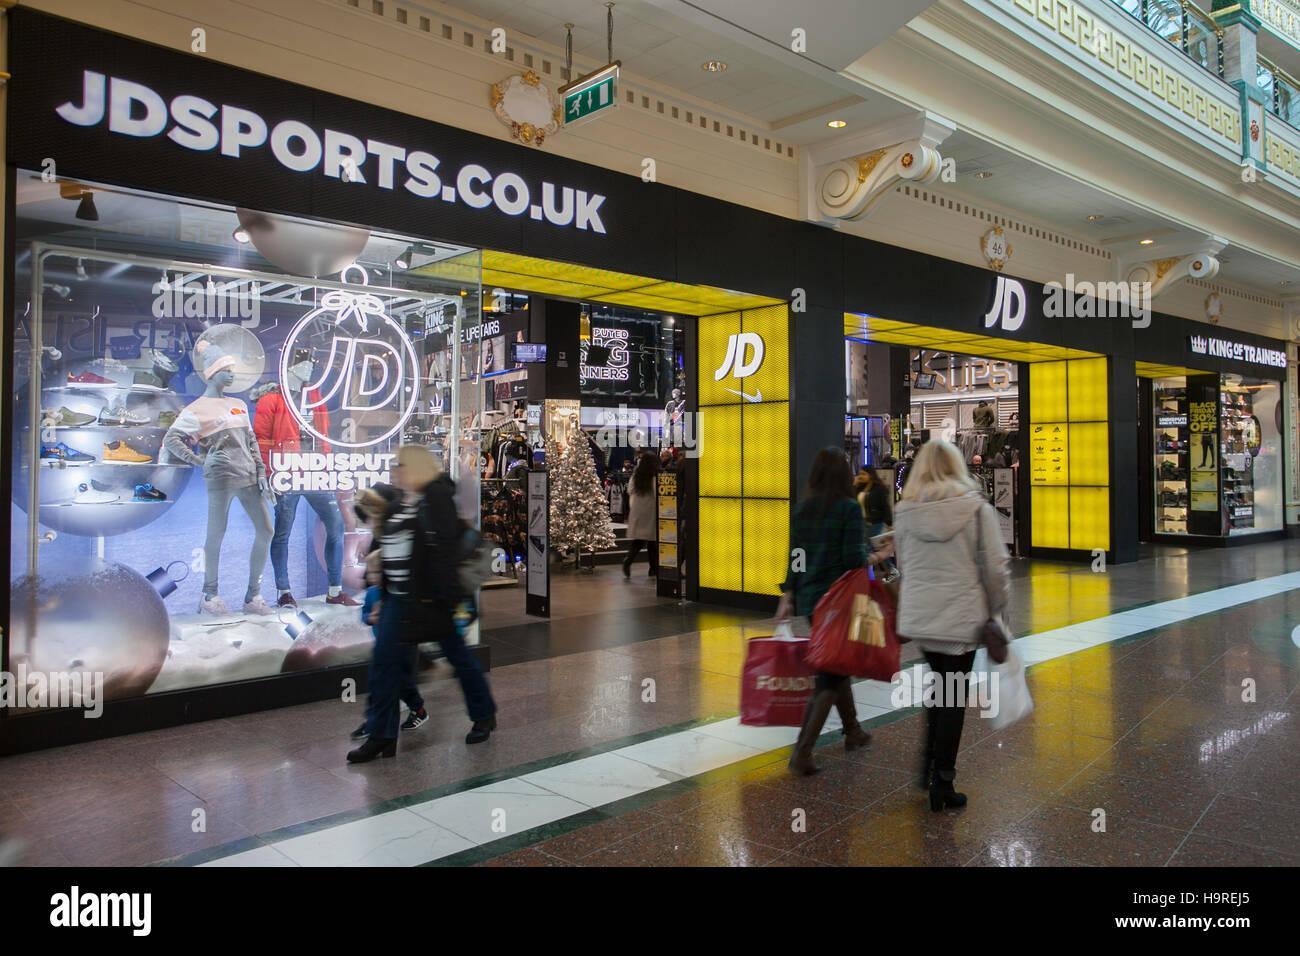 Jd Sports Store Uk Stock Photos & Jd Sports Store Uk Stock